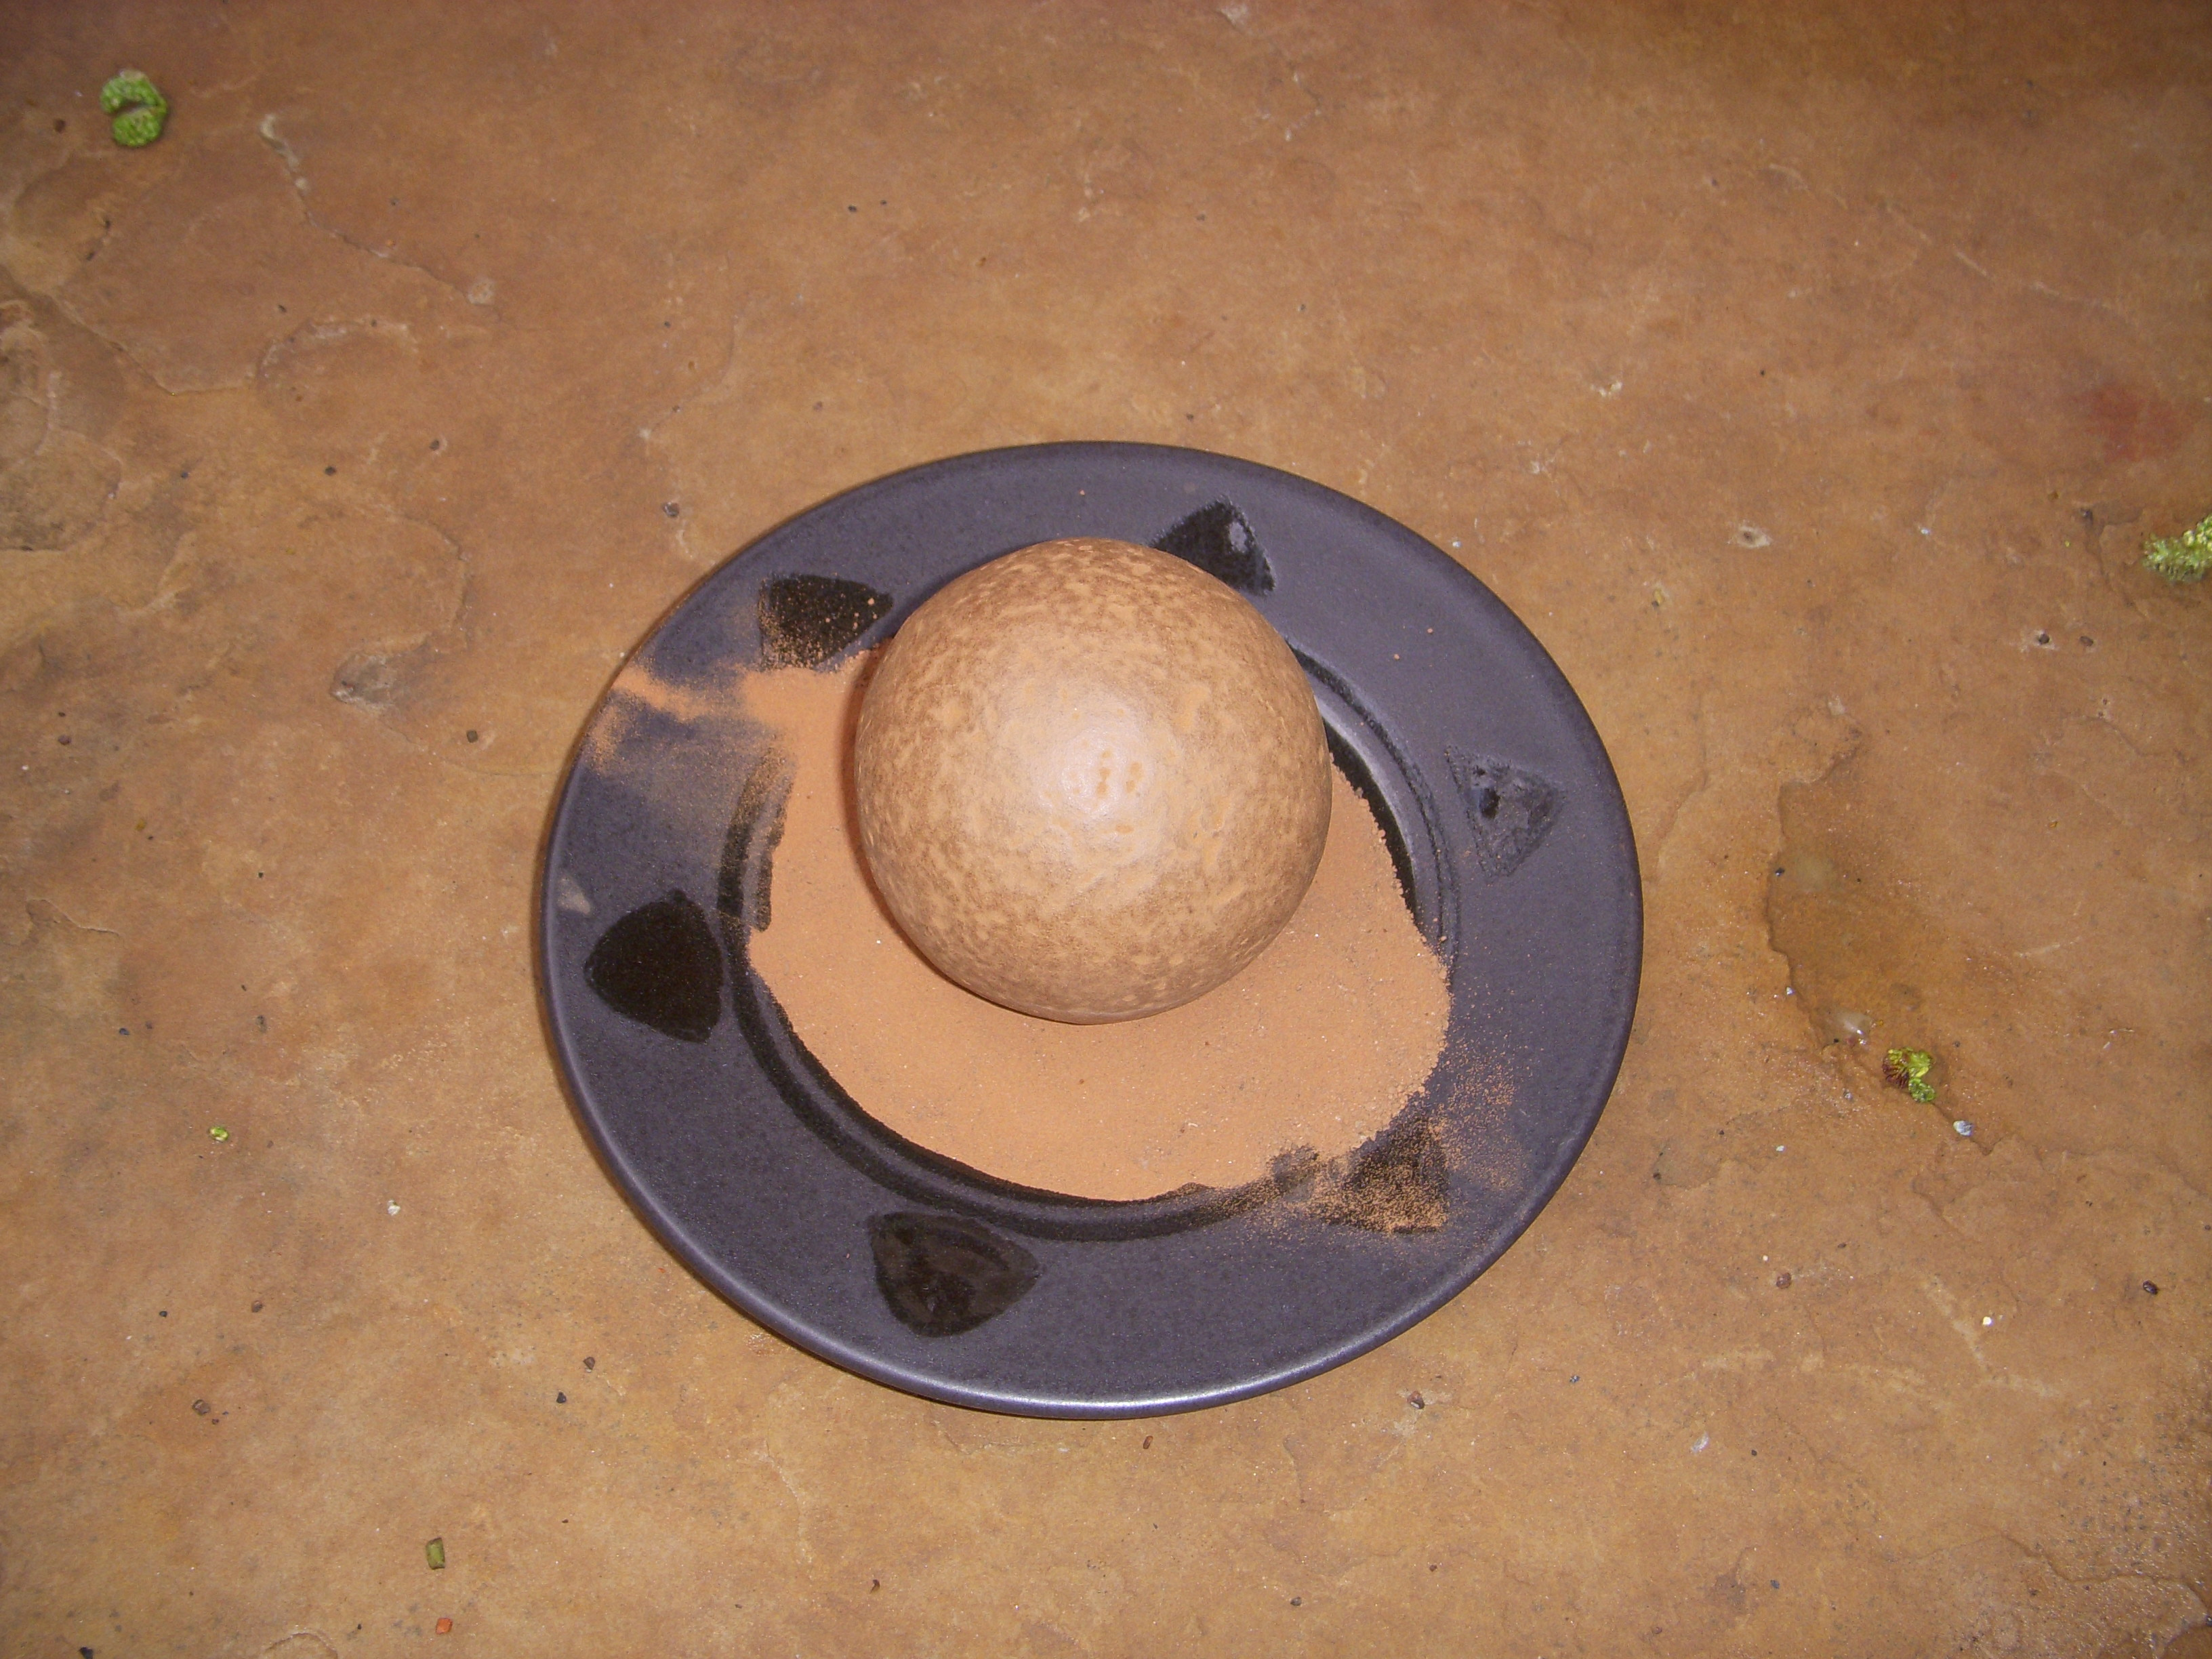 My first dorodango, from a deposit of soil in Sedona, AZ